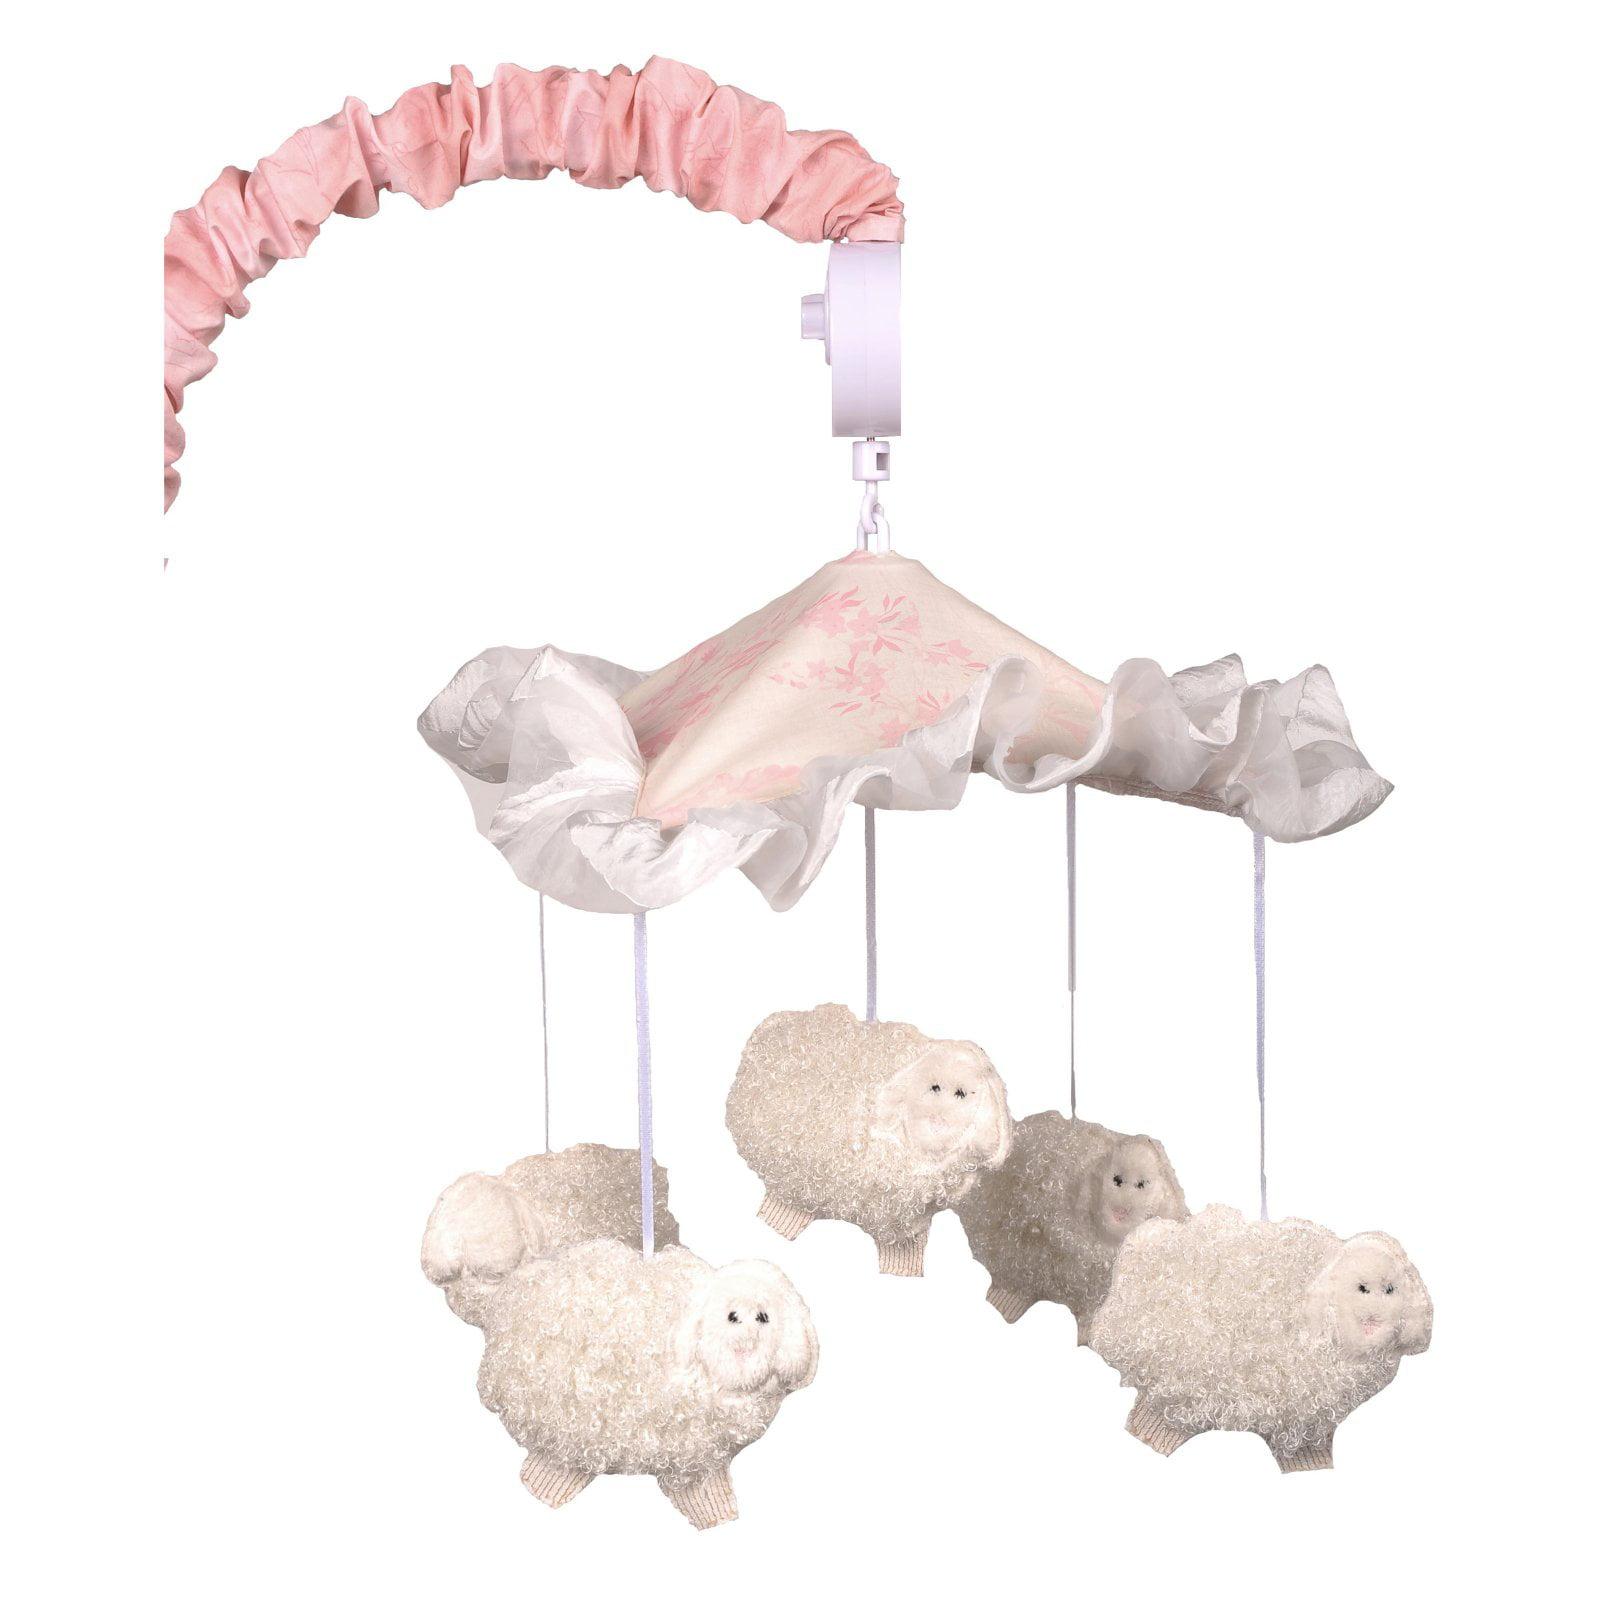 Cotton Tale Designs Heaven Sent Girl Musical Mobile